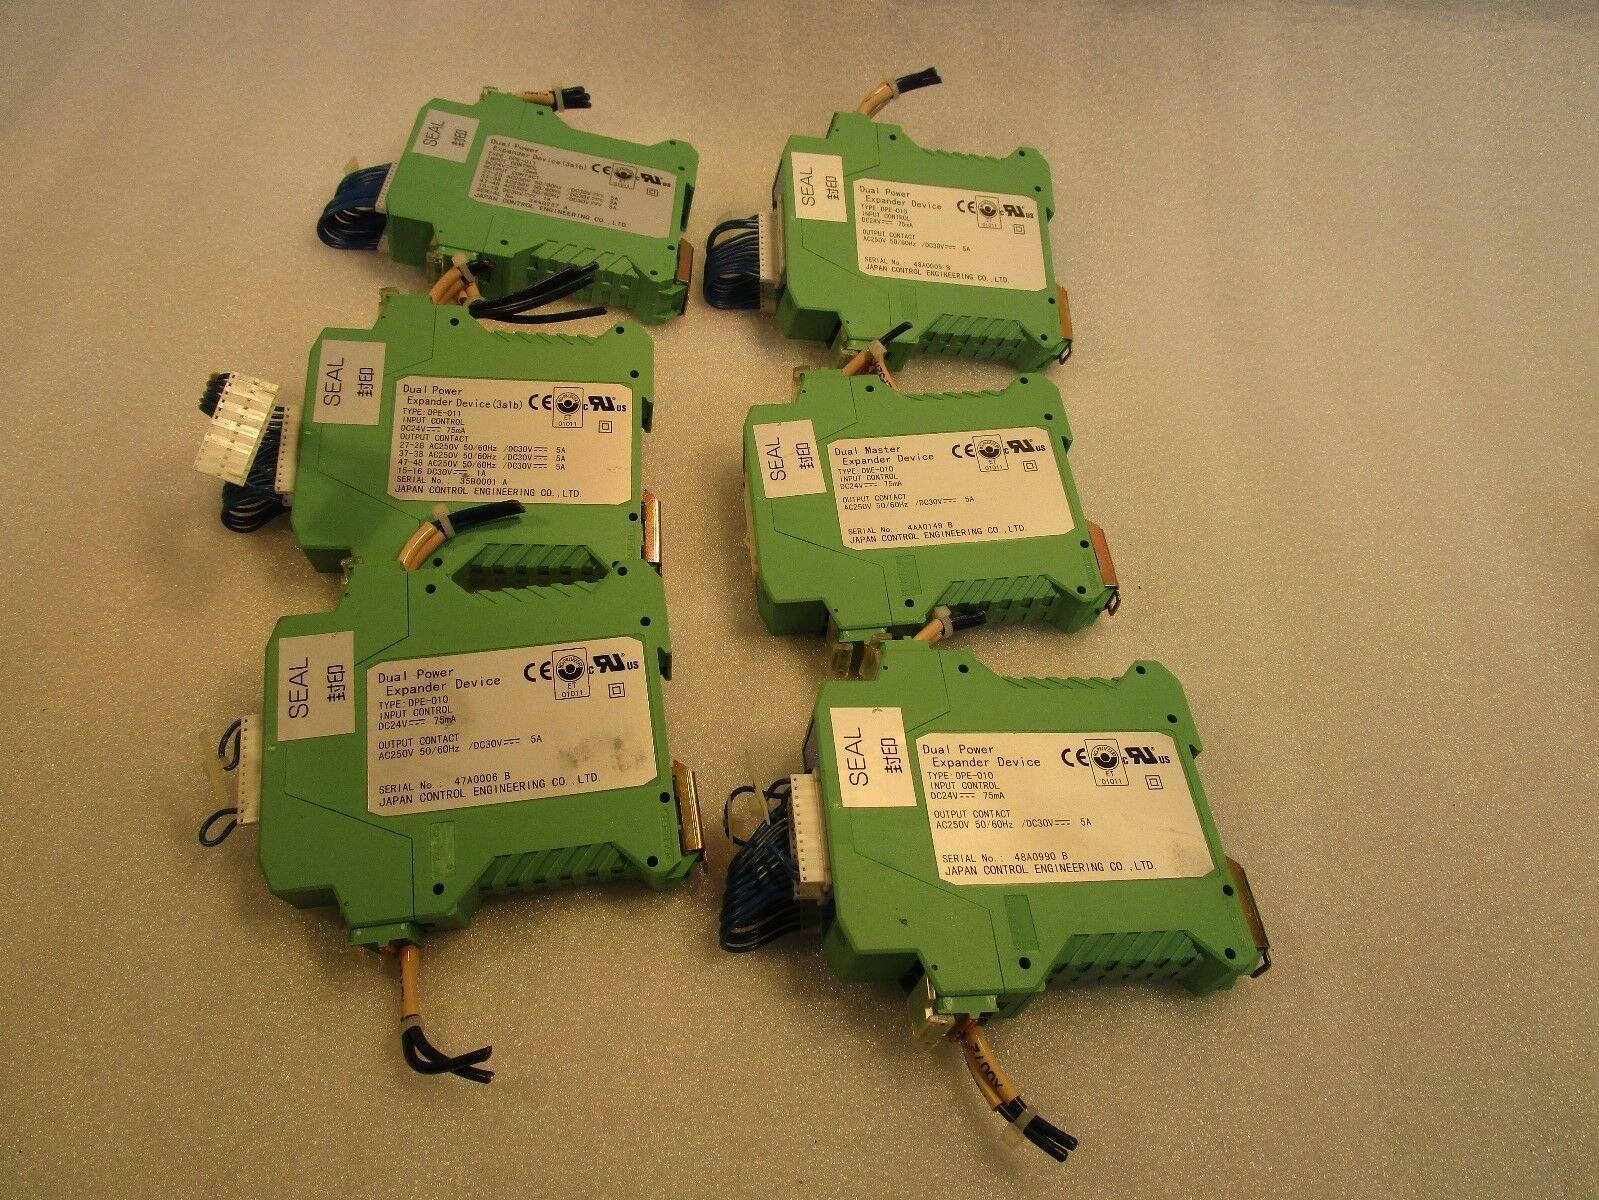 JSK Co Japan Control Engineering JCE DPE-010 Dual Power Expander Device